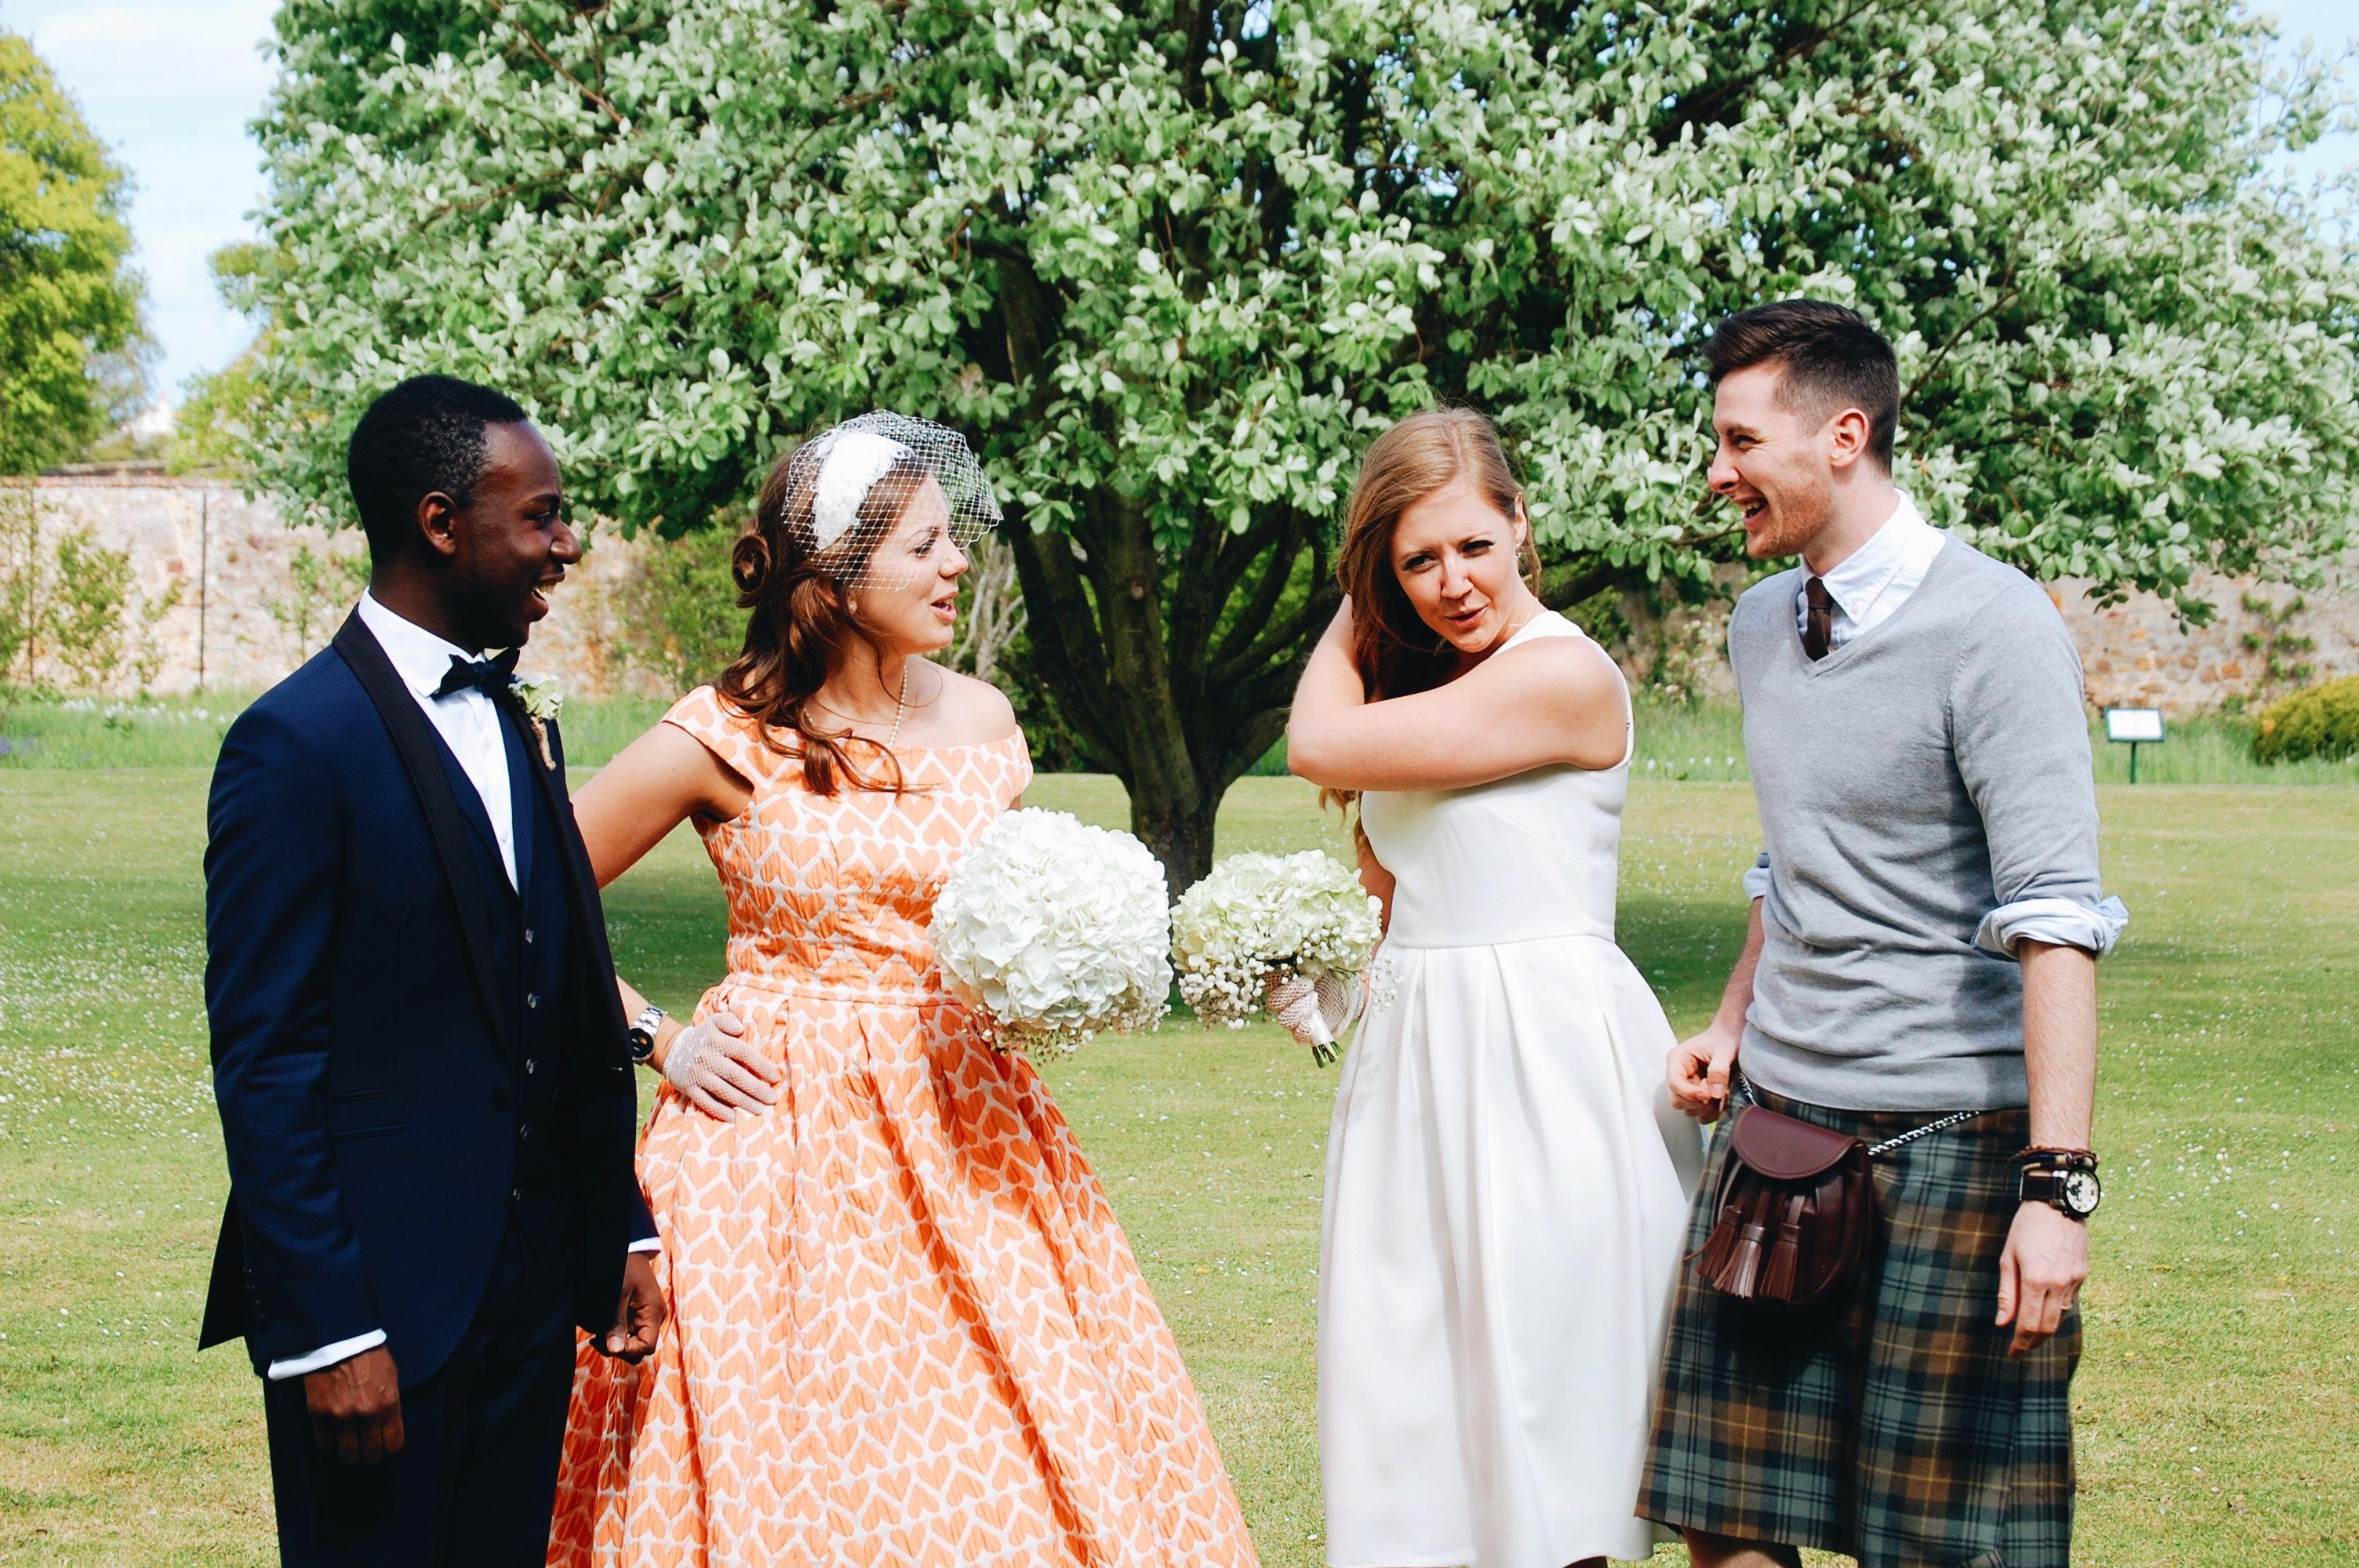 Best wedding dresses for the maids  Best Maidus Husband Jake in kilt  Scottish wedding Elona and